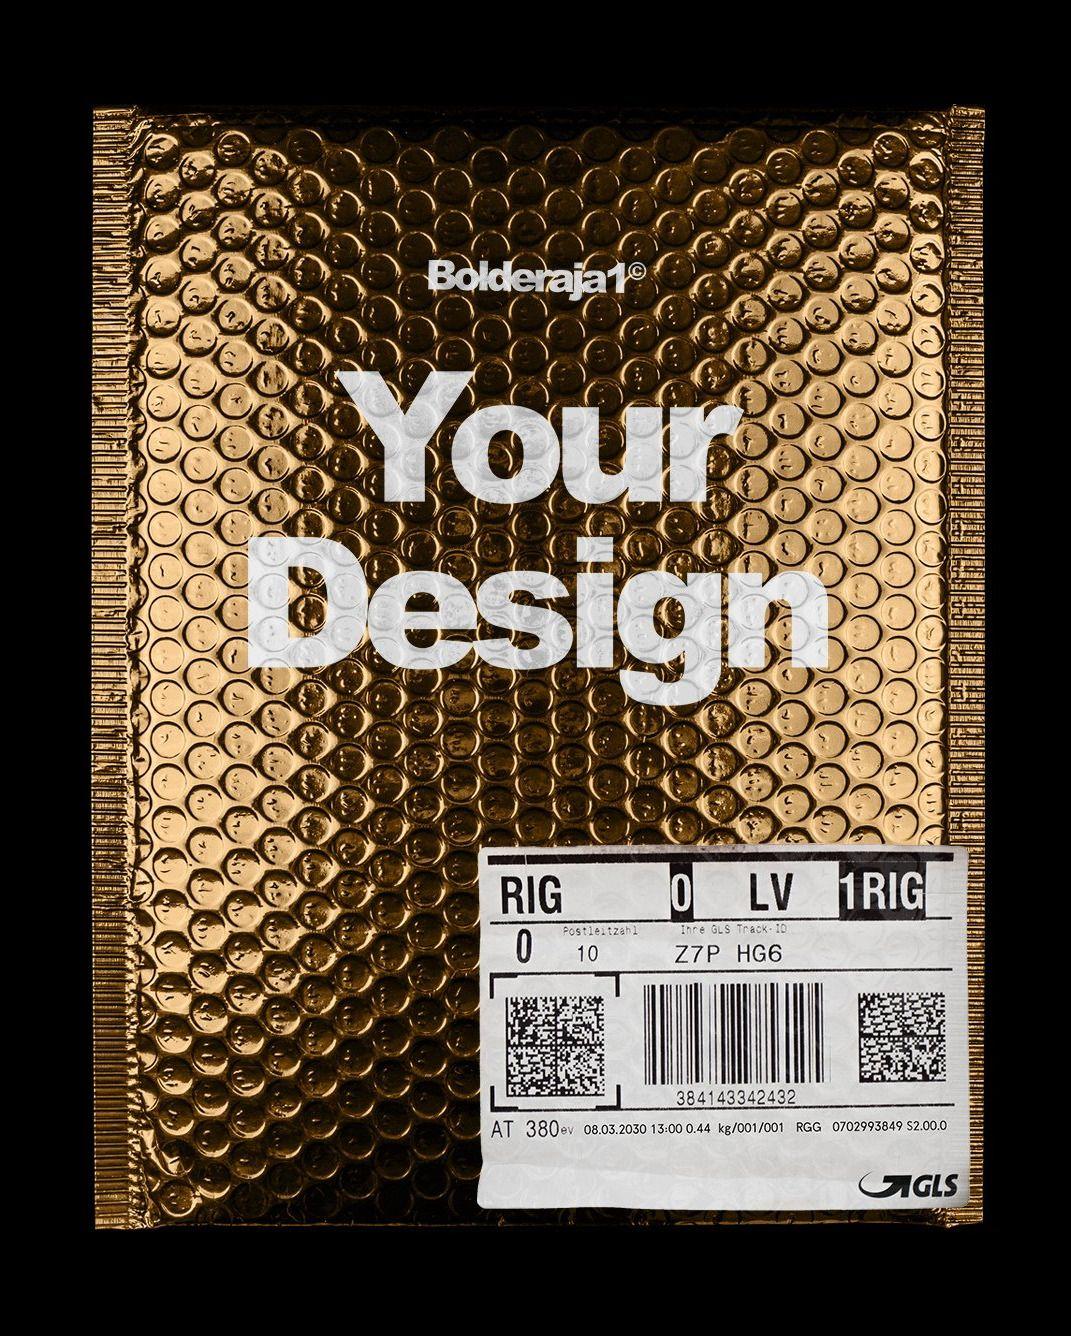 Download Gold Plastic Bag Mockup Plastic Bag Packaging Handmade Packaging Creative Packaging Design